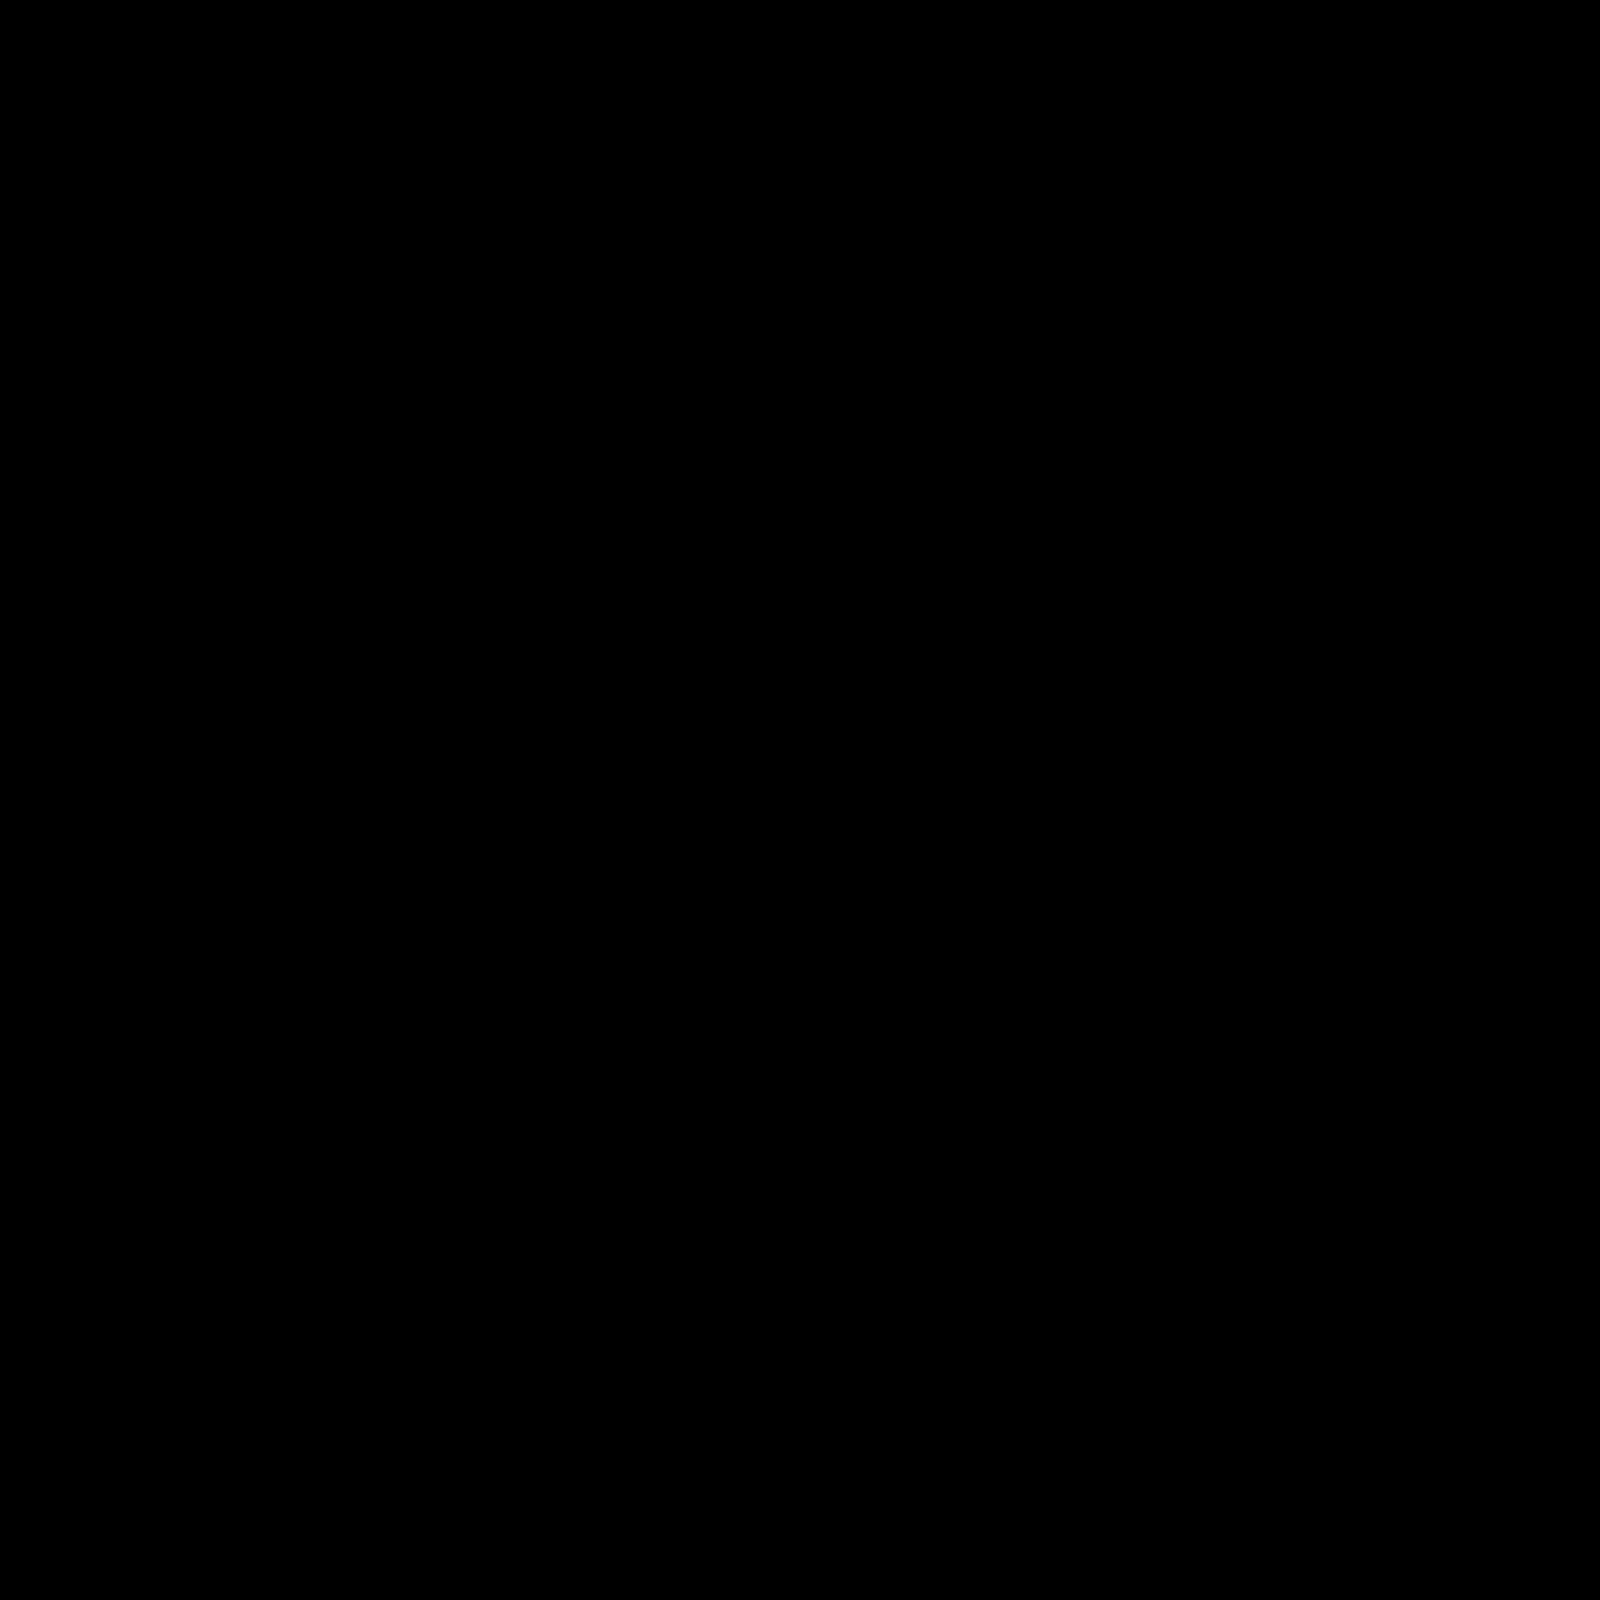 Work Light icon